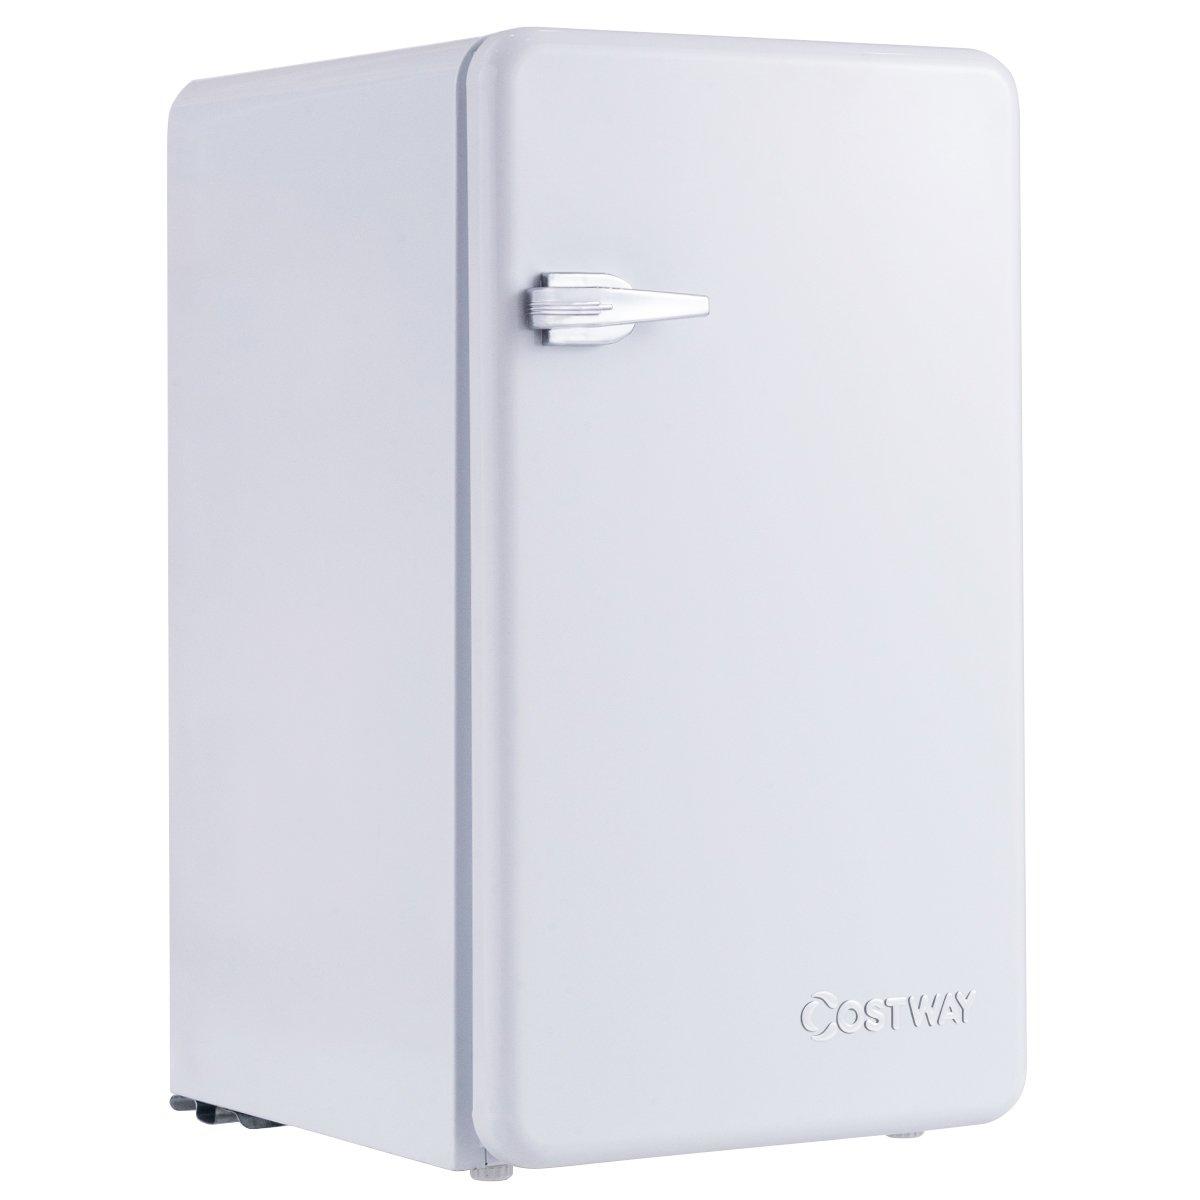 Costway Compact Refrigerator Single Door Mini Fridge with Freezer, 3.2 Cubic Ft. w/Handle (White)